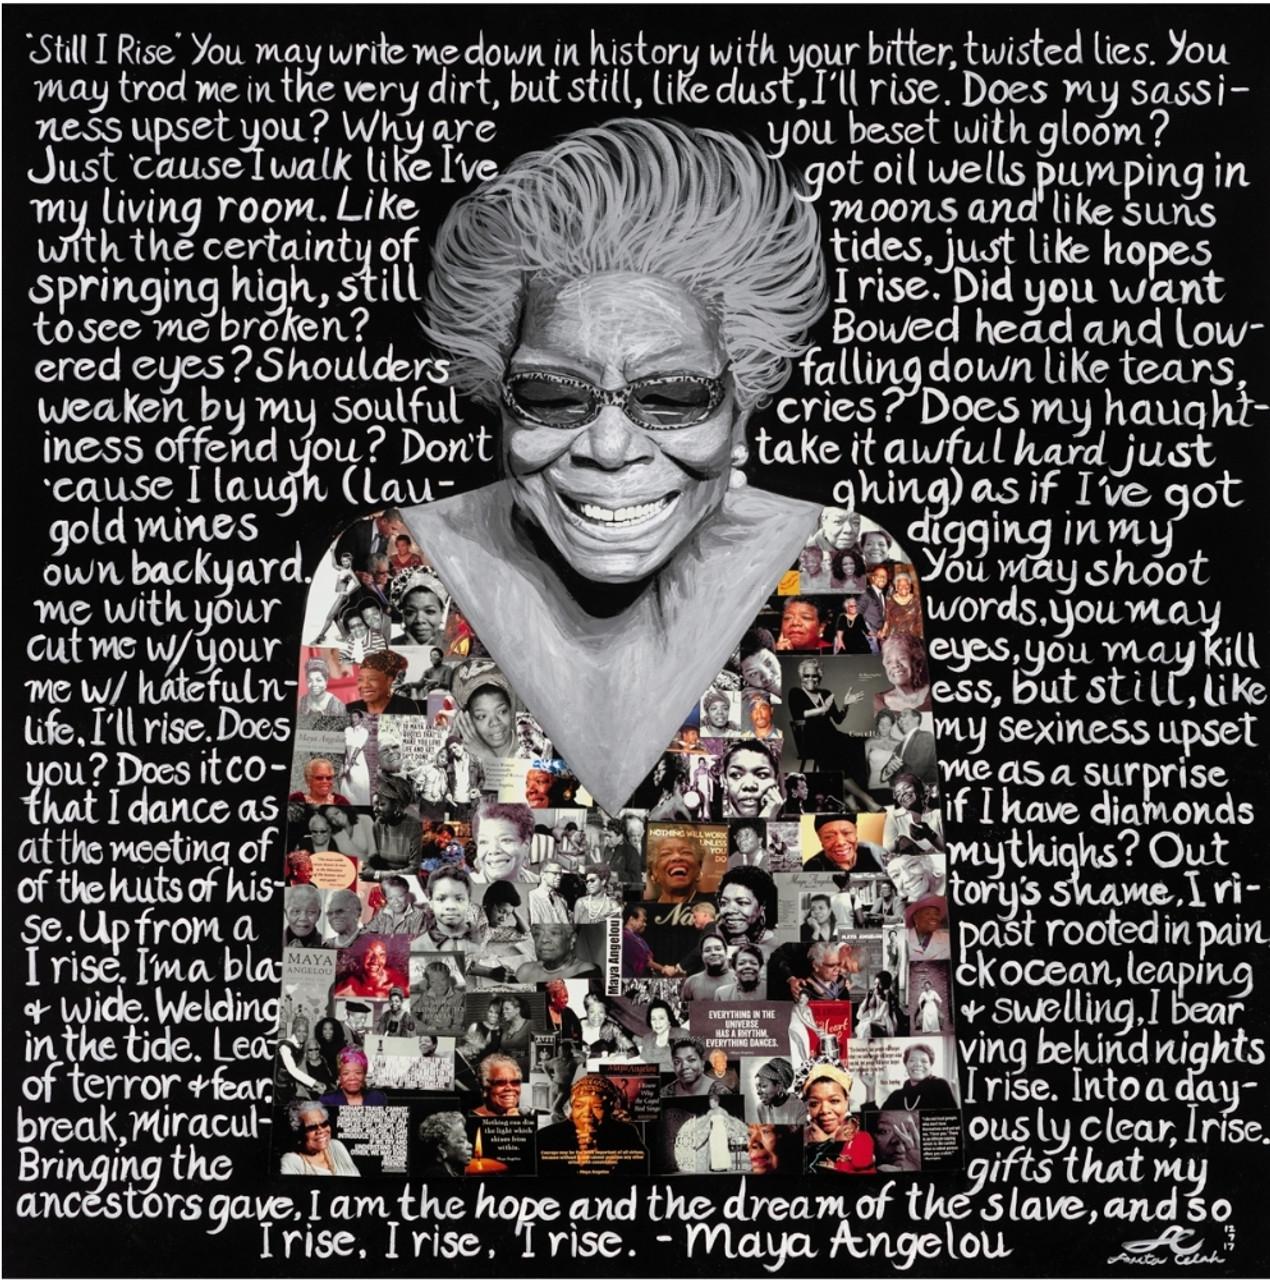 18 x 18 Maya Angelou: Still I Rise